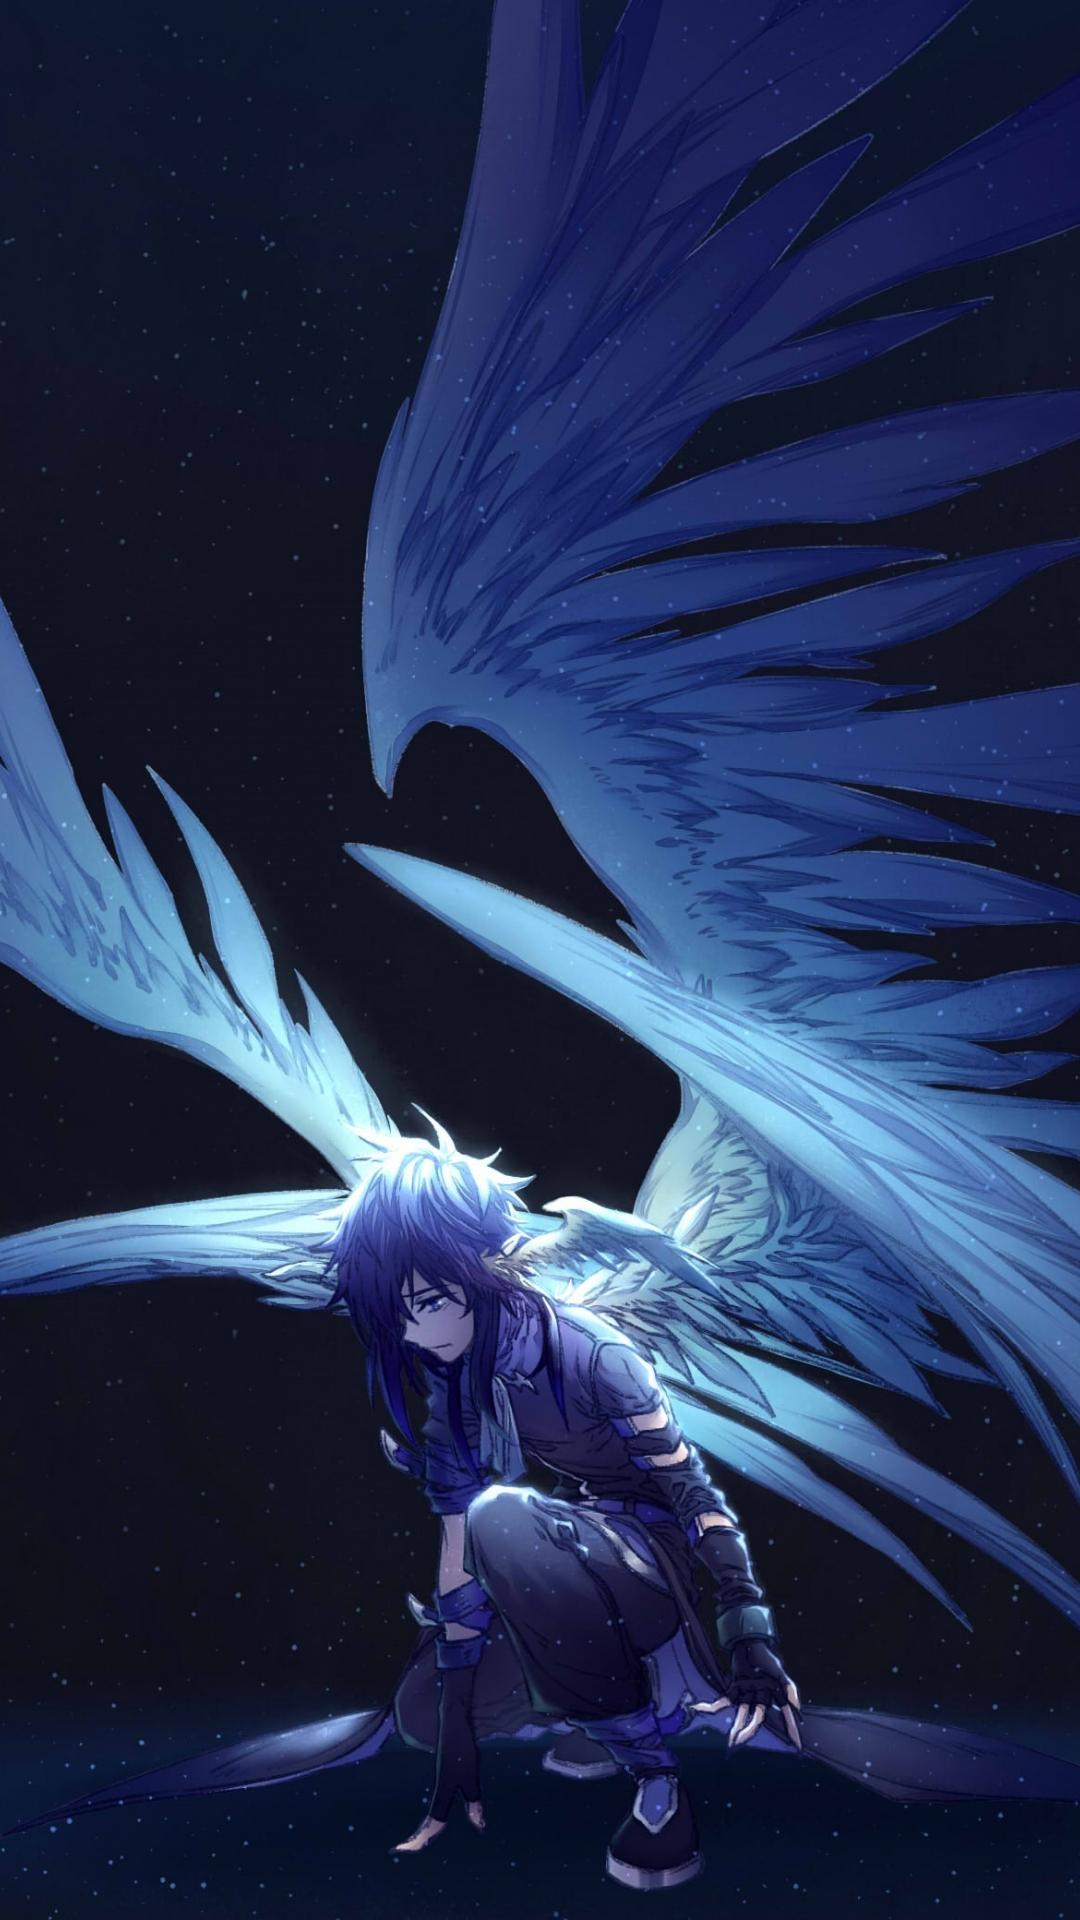 Wallpaper Anime Hd For Xiaomi Anime Wallpaper Hd